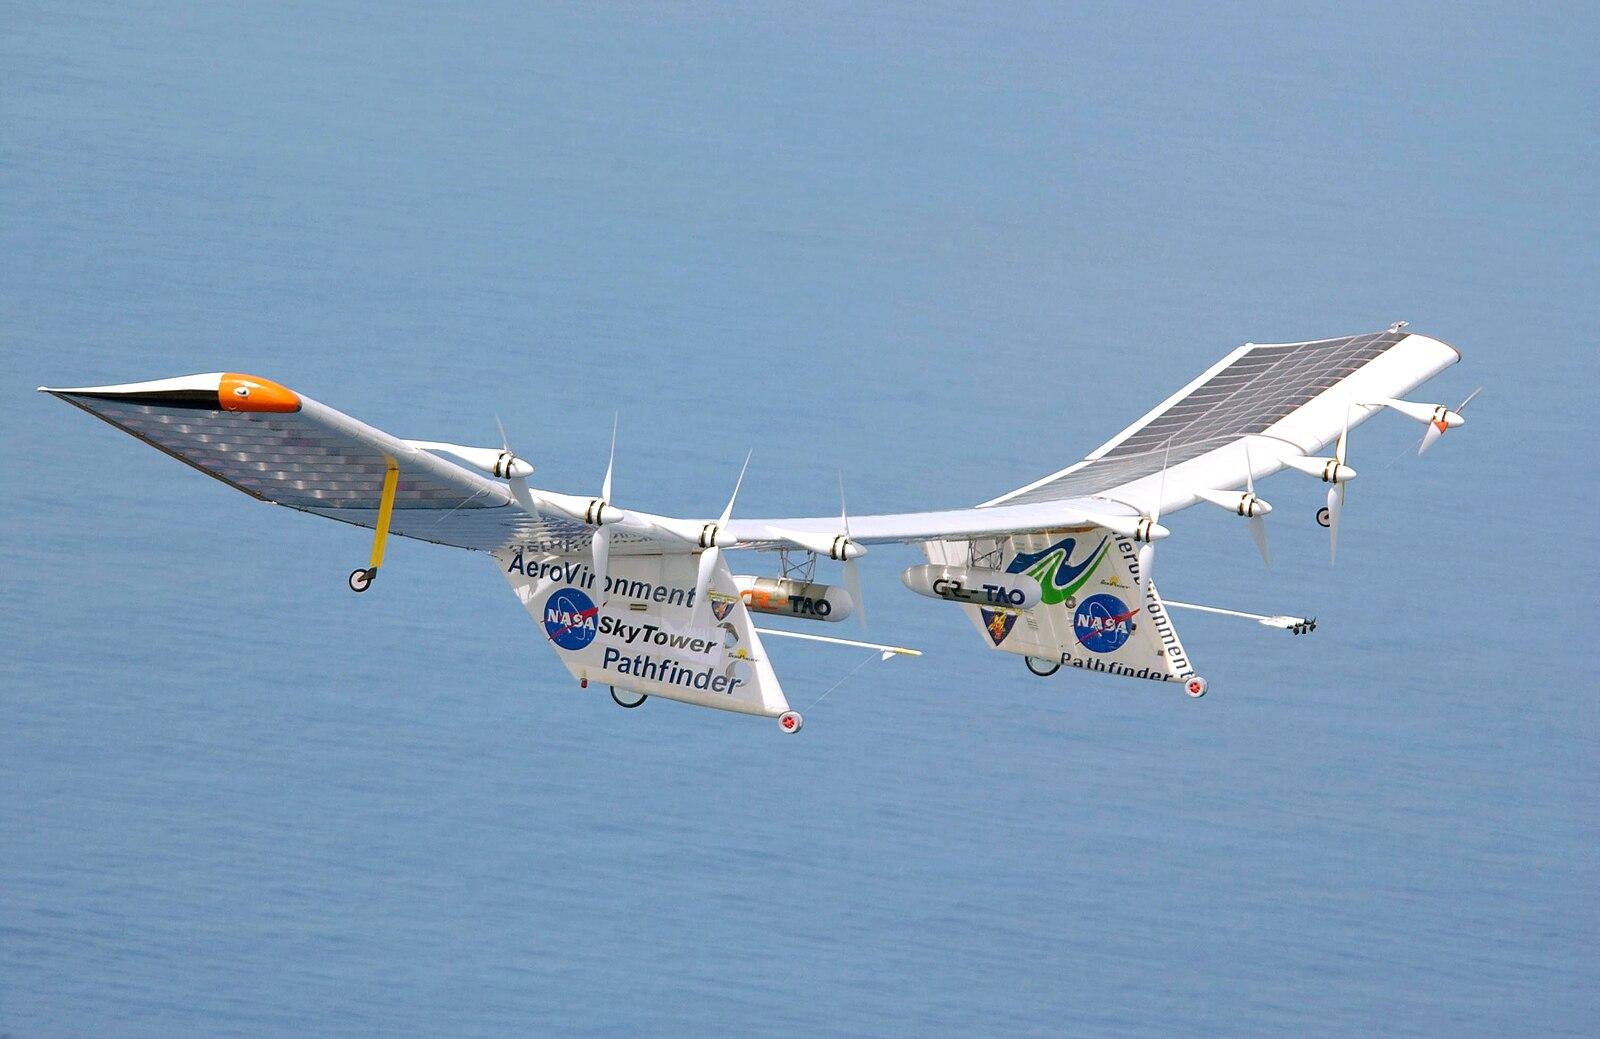 1600px-Pathfinder_Plus_solar_aircraft_ov